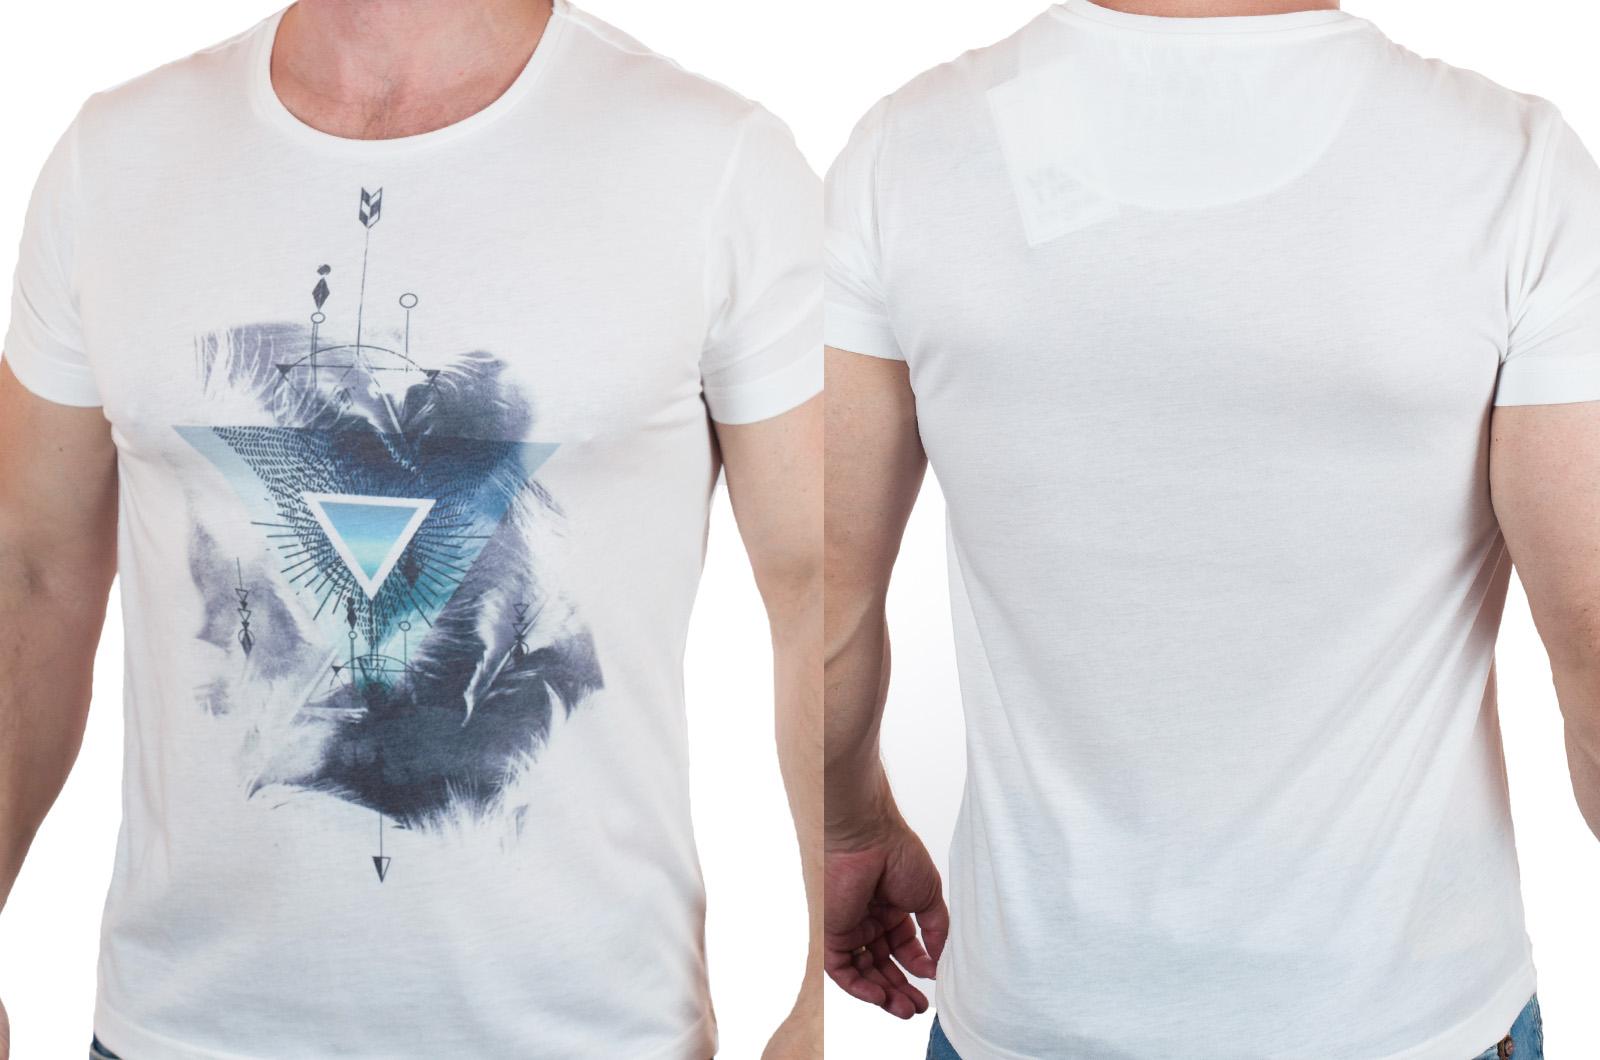 Трендовая футболка от бренда Max Youngmen с доставкой